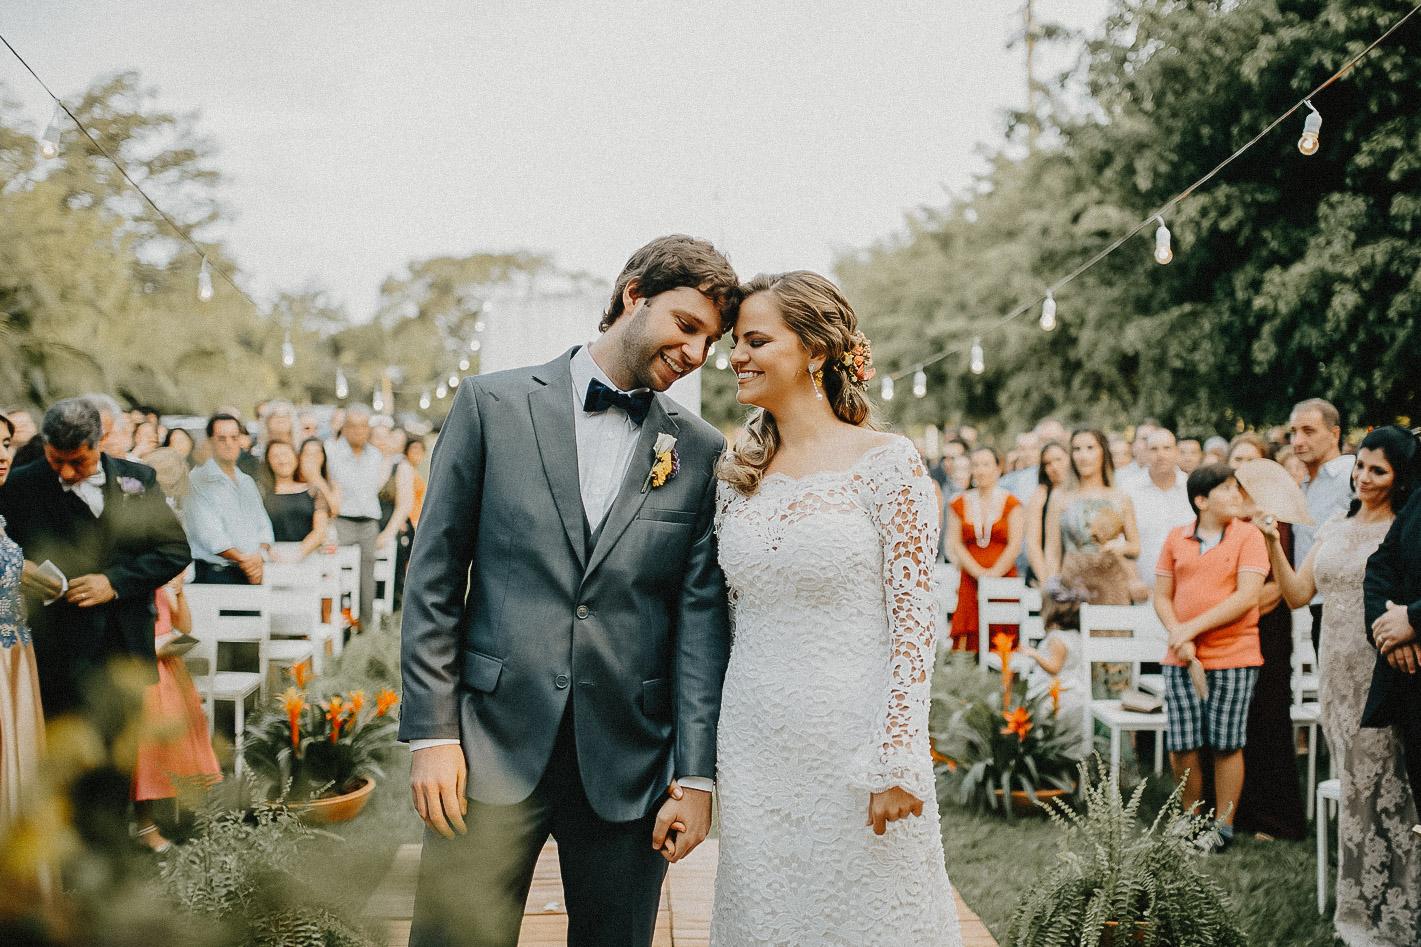 best irish wedding photographer - elopement ireland - dublin wedding photographer - irish wedding photographer - -28.jpg